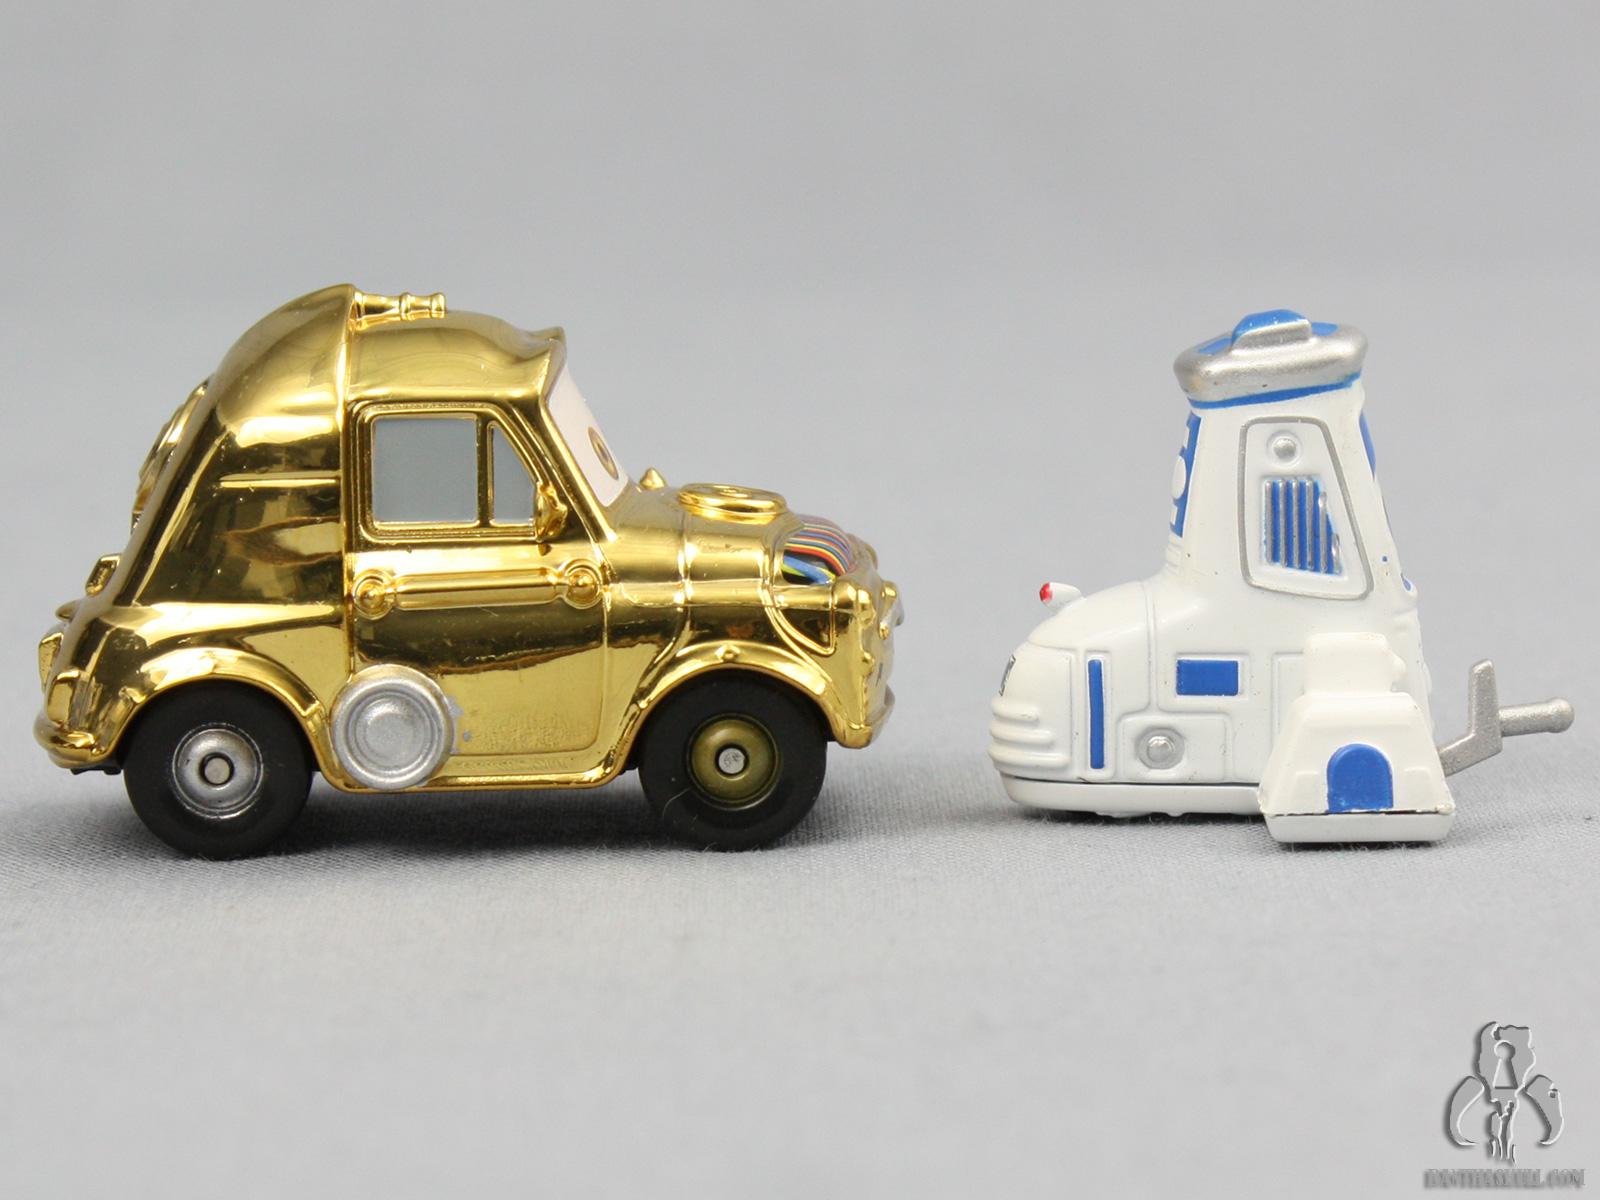 Disney Pixar Star Wars Cars Luigi Amp Guido As C 3po Amp R2 D2